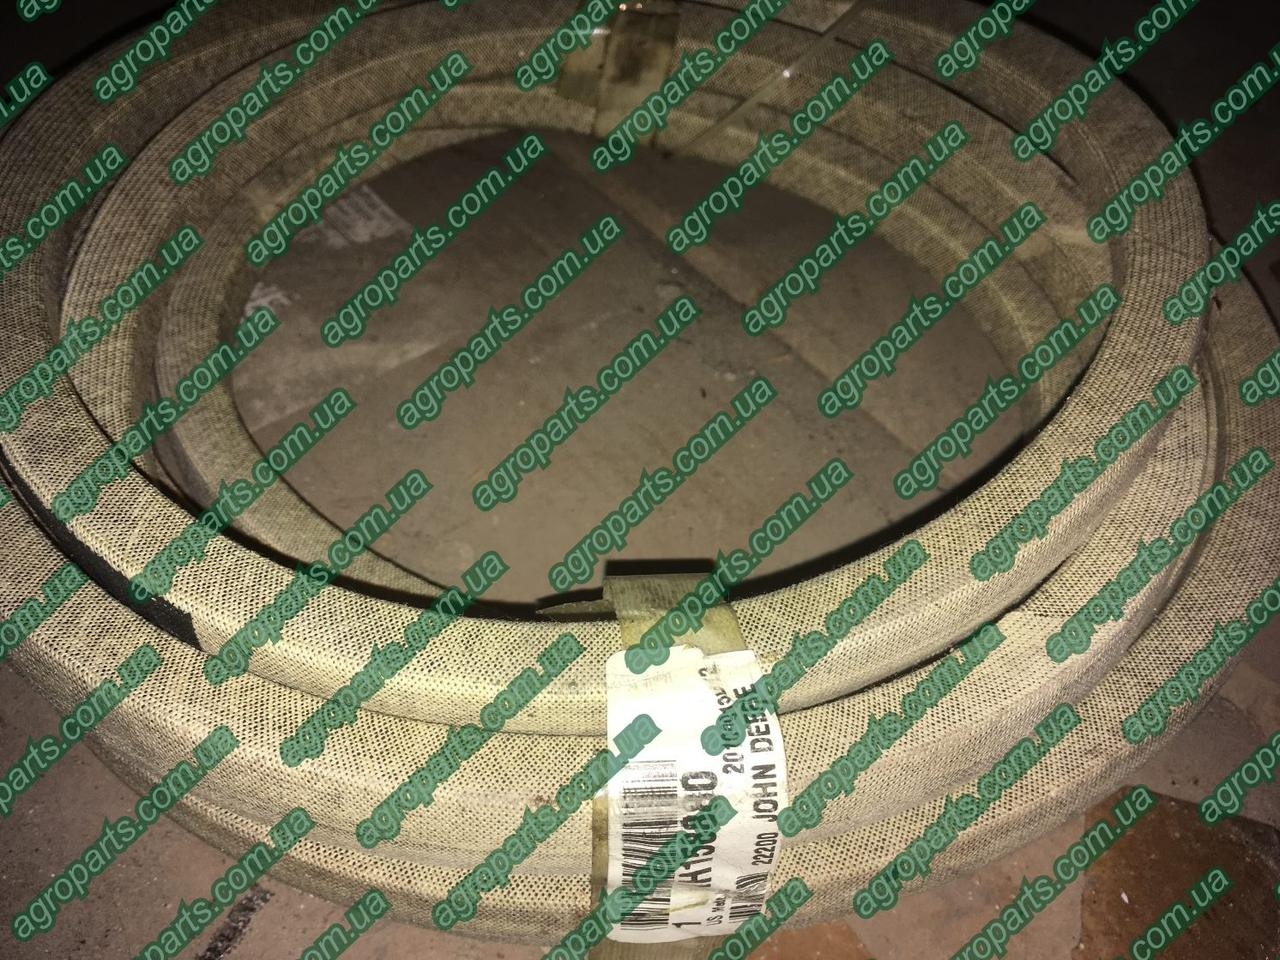 Ремень AH158880 (2шт) привод выгрузного шнека V-Belt пас AH127866 запчасти з/ч John Deere ремни AH127866